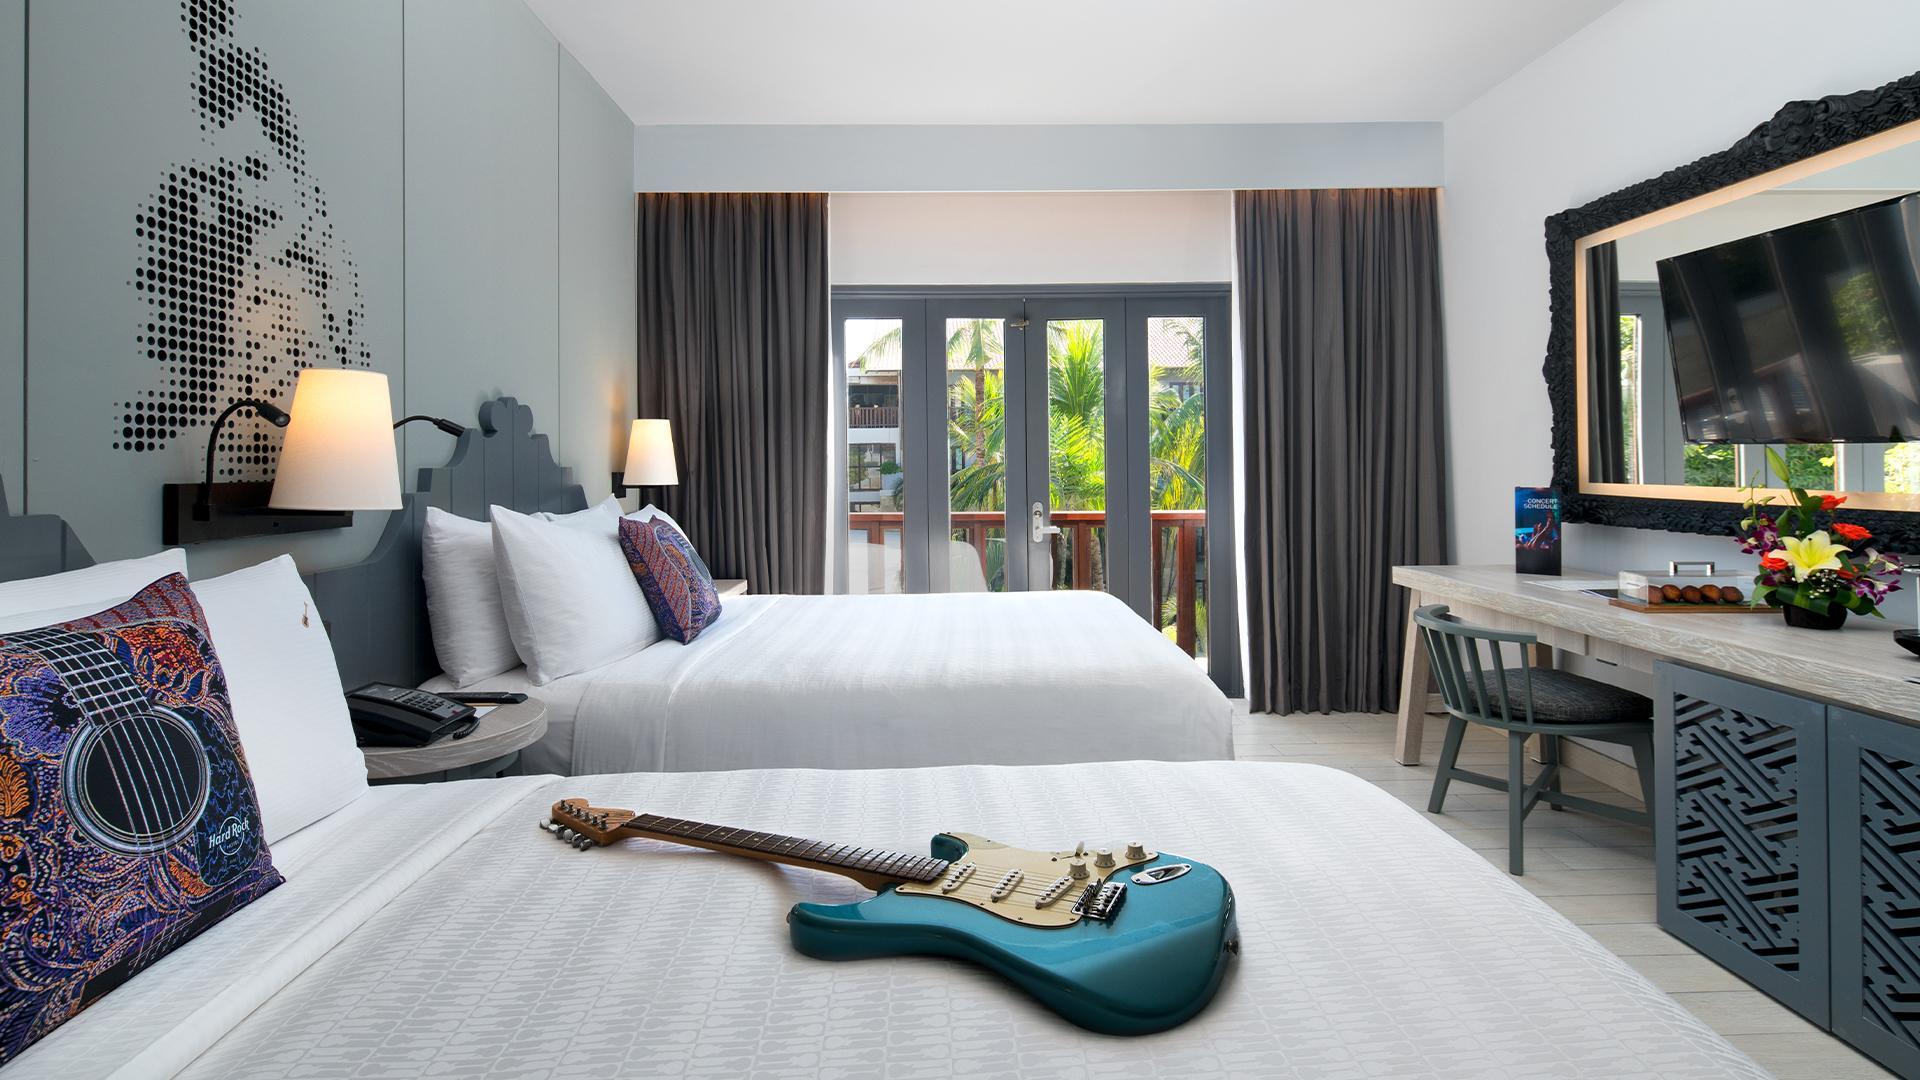 Deluxe Premium Room image 1 at Hard Rock Hotel Bali by Kabupaten Badung, Bali, Indonesia